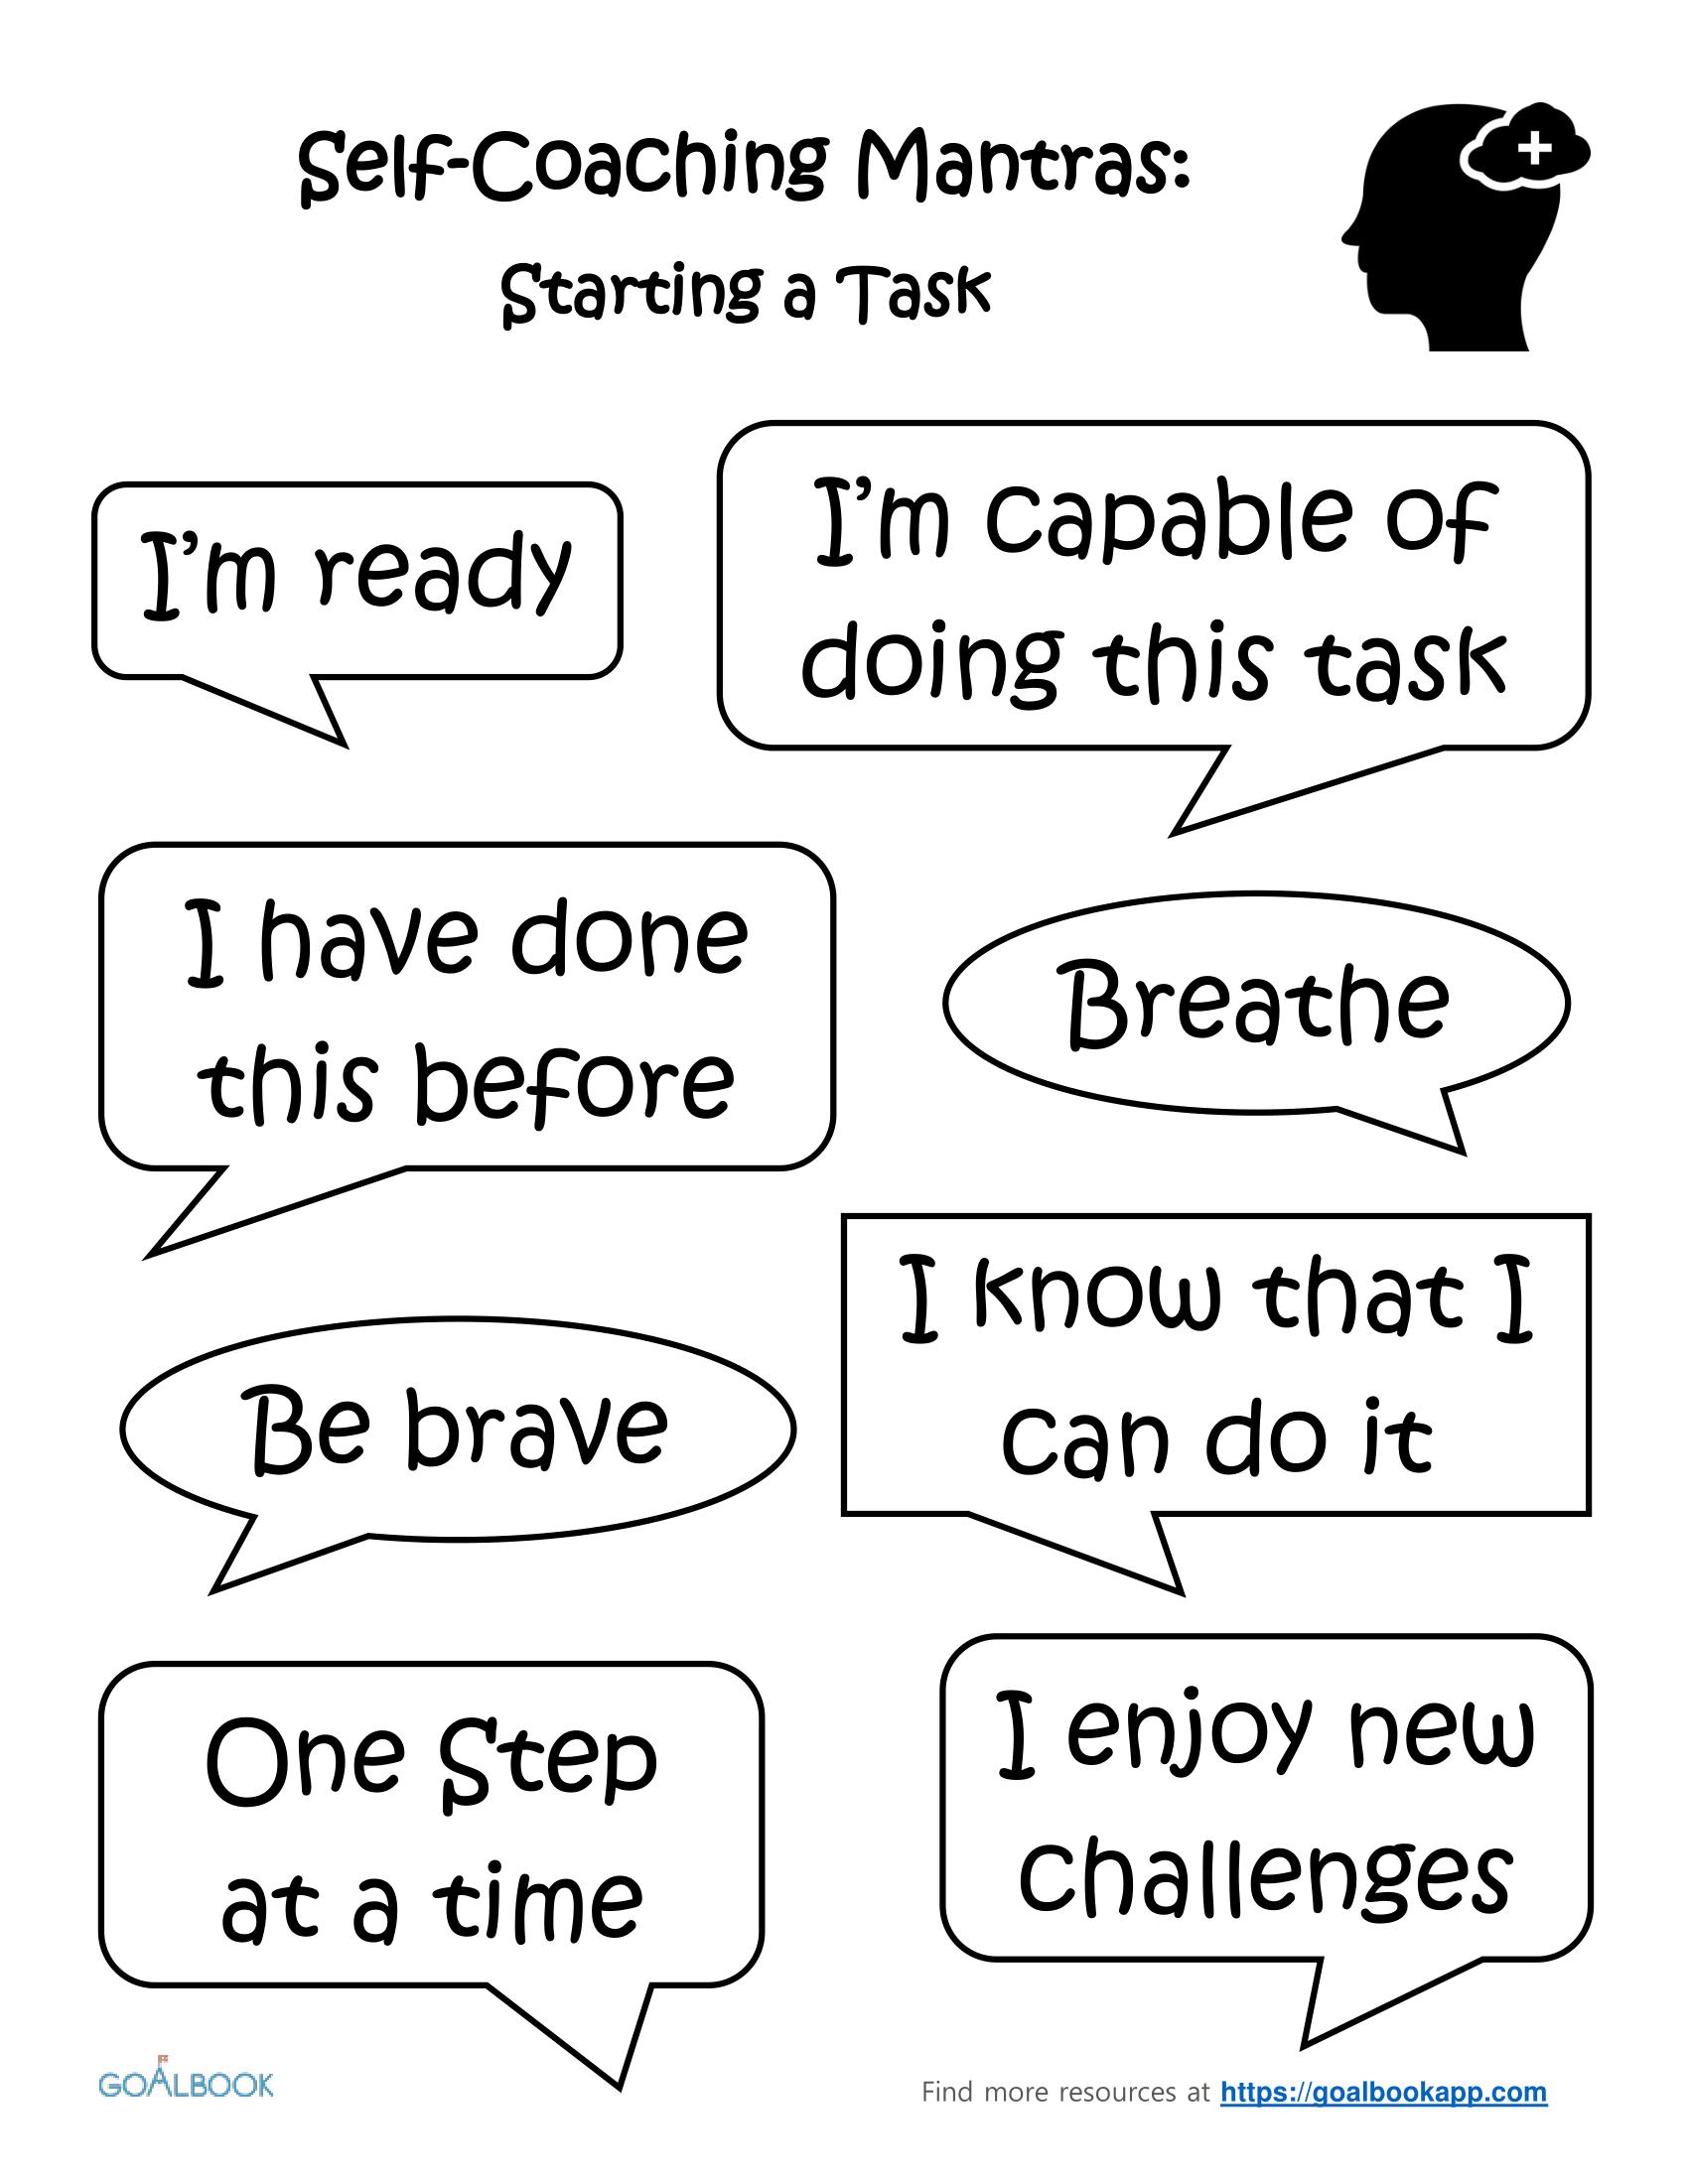 Starting a Task: Self-Coaching Mantras